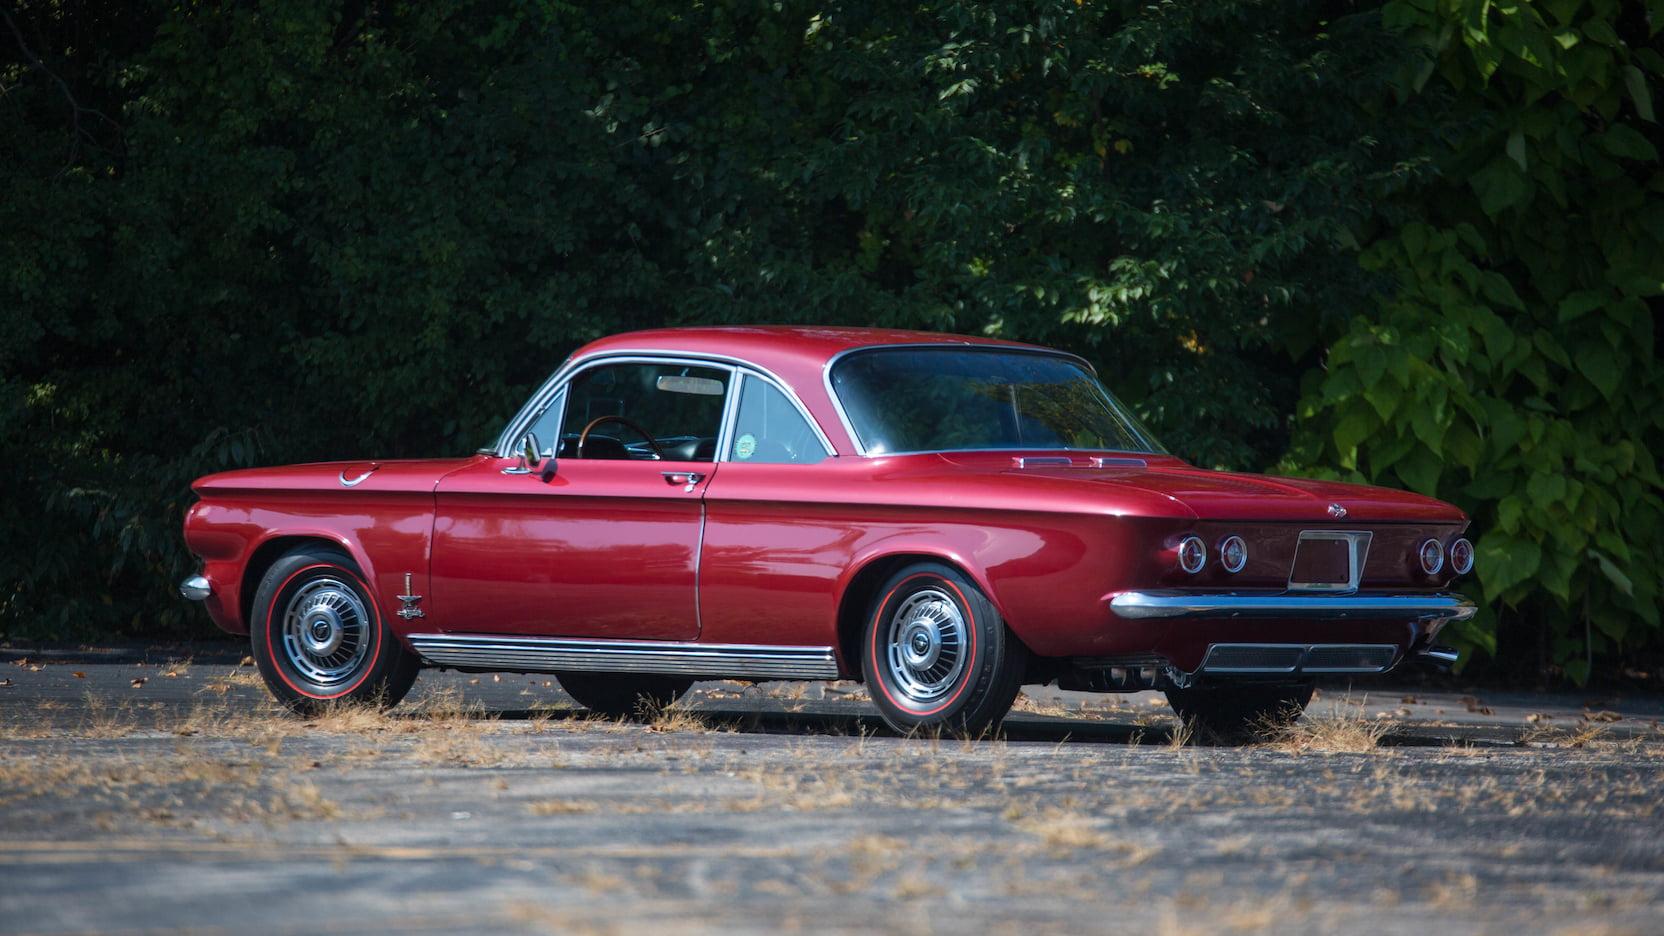 1963 Chevrolet Corvair rear 3/4